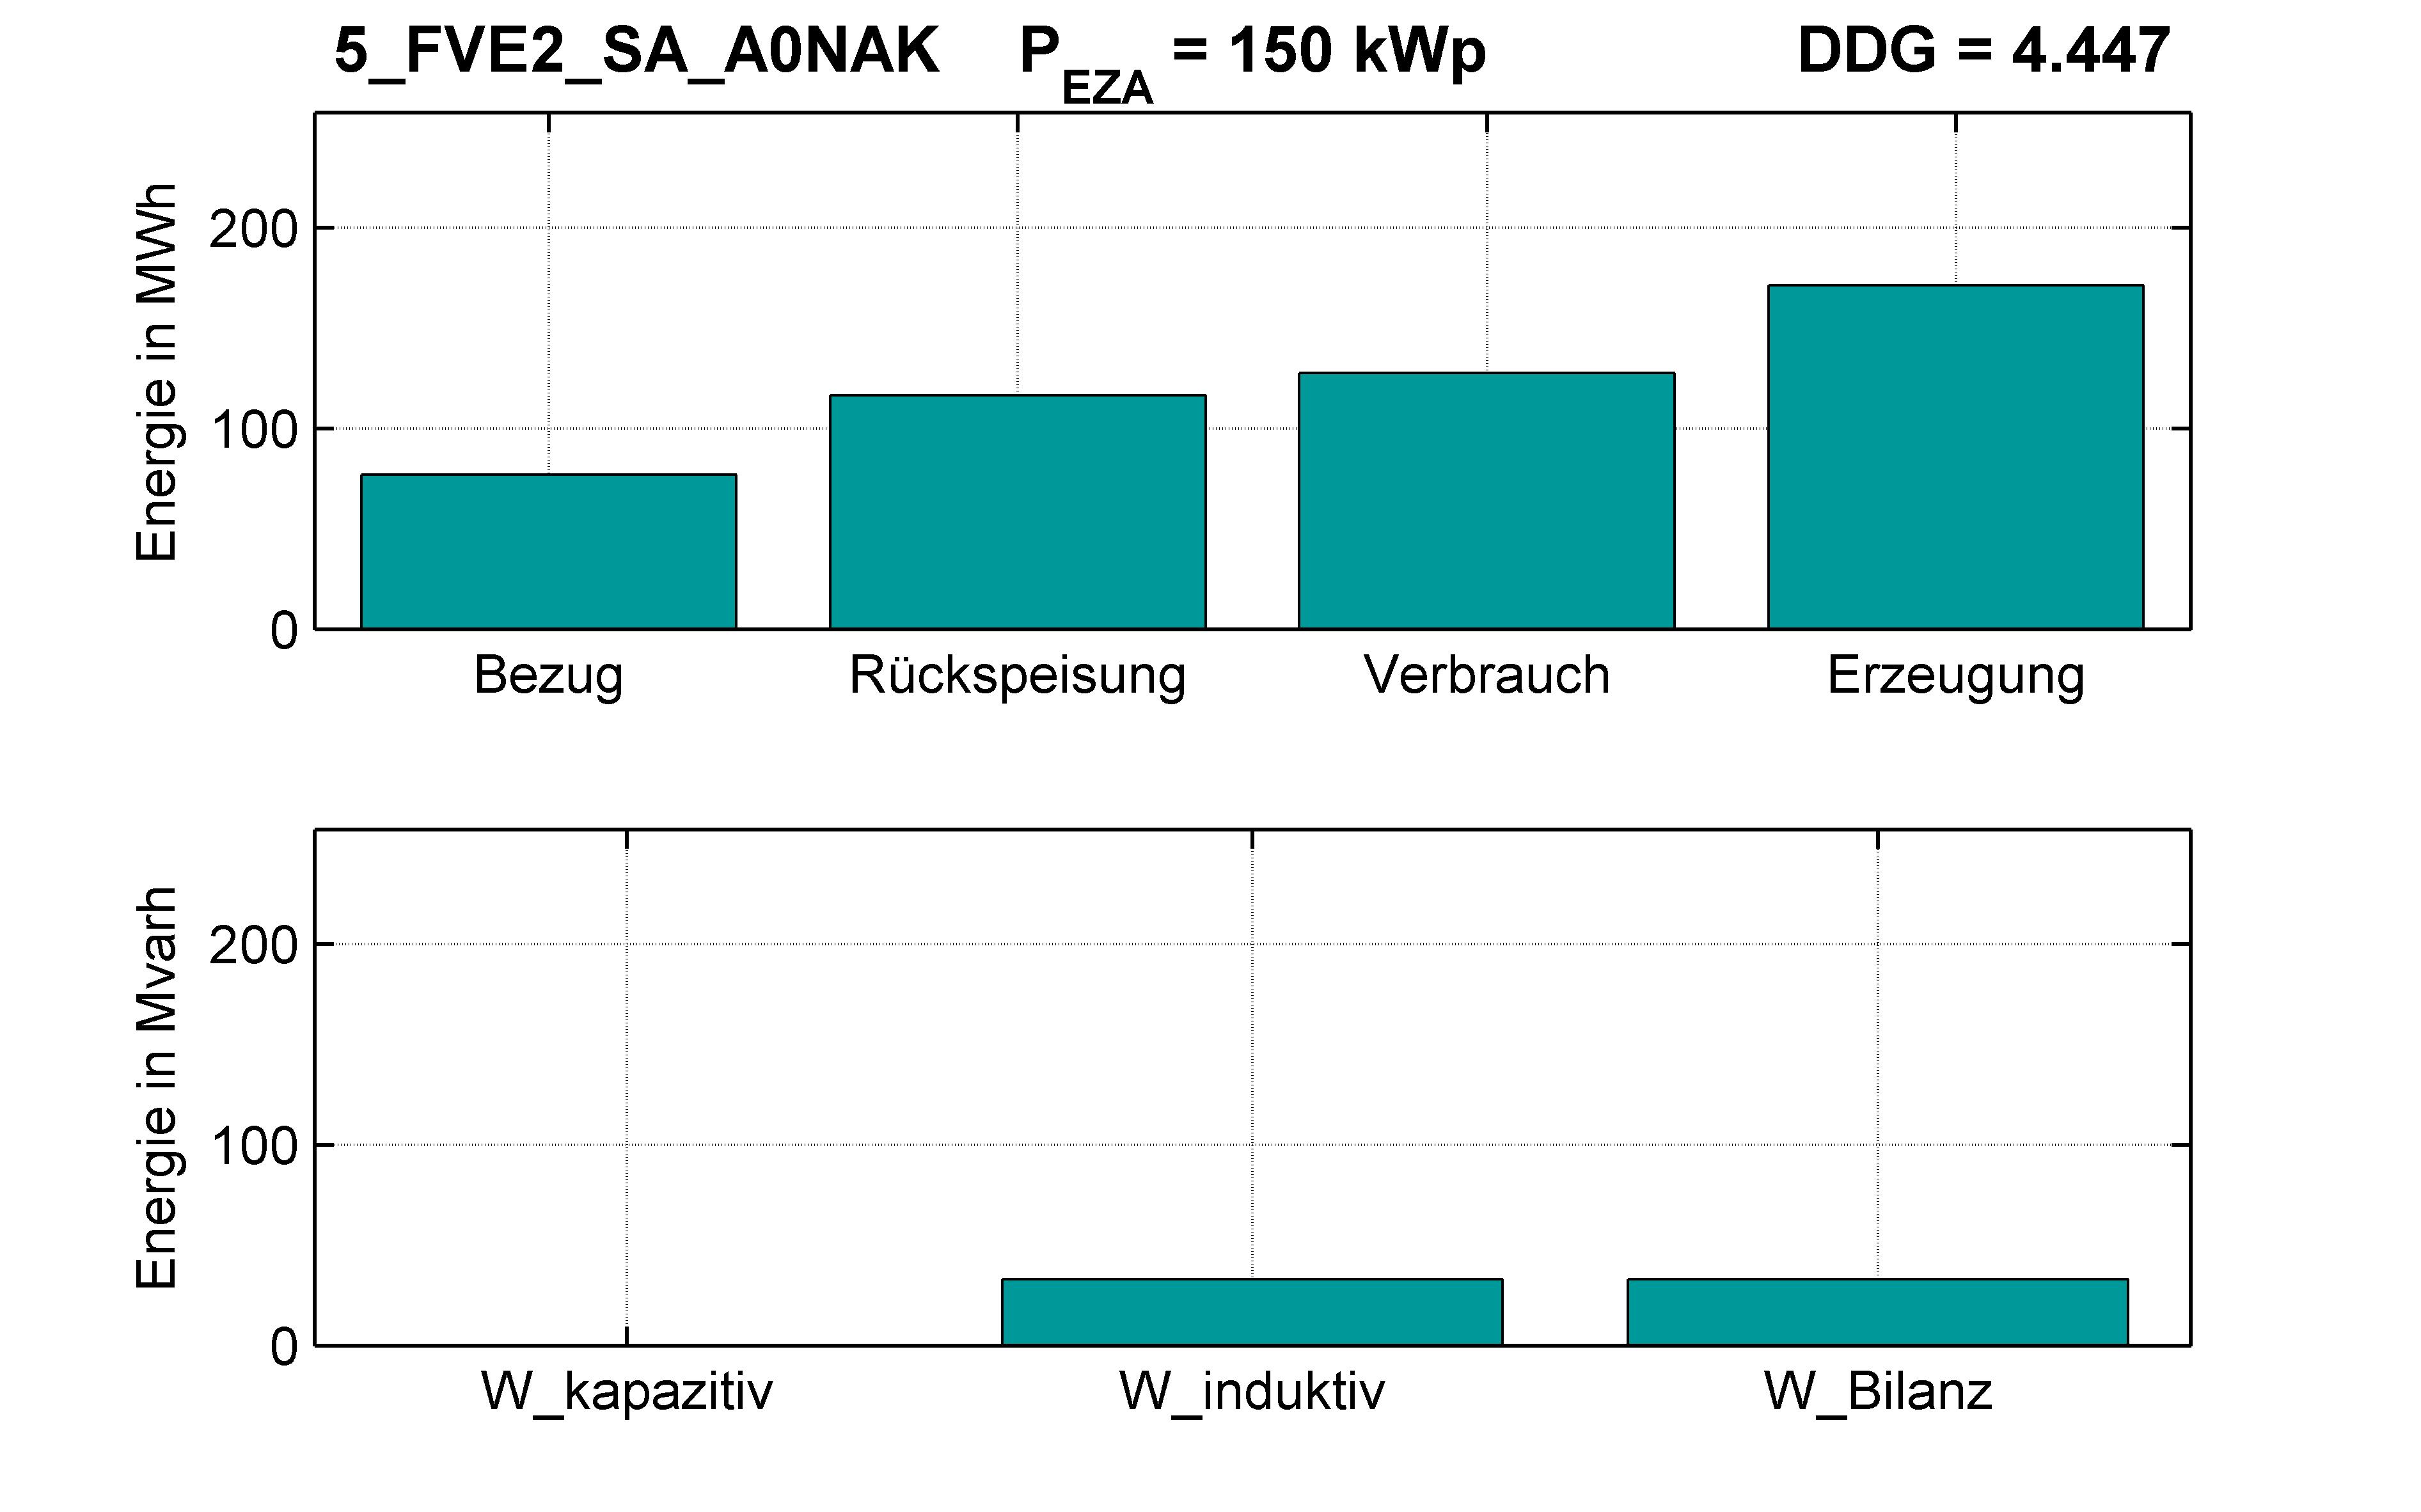 FVE2 | STATION (SA) A0NAK | PQ-Bilanz